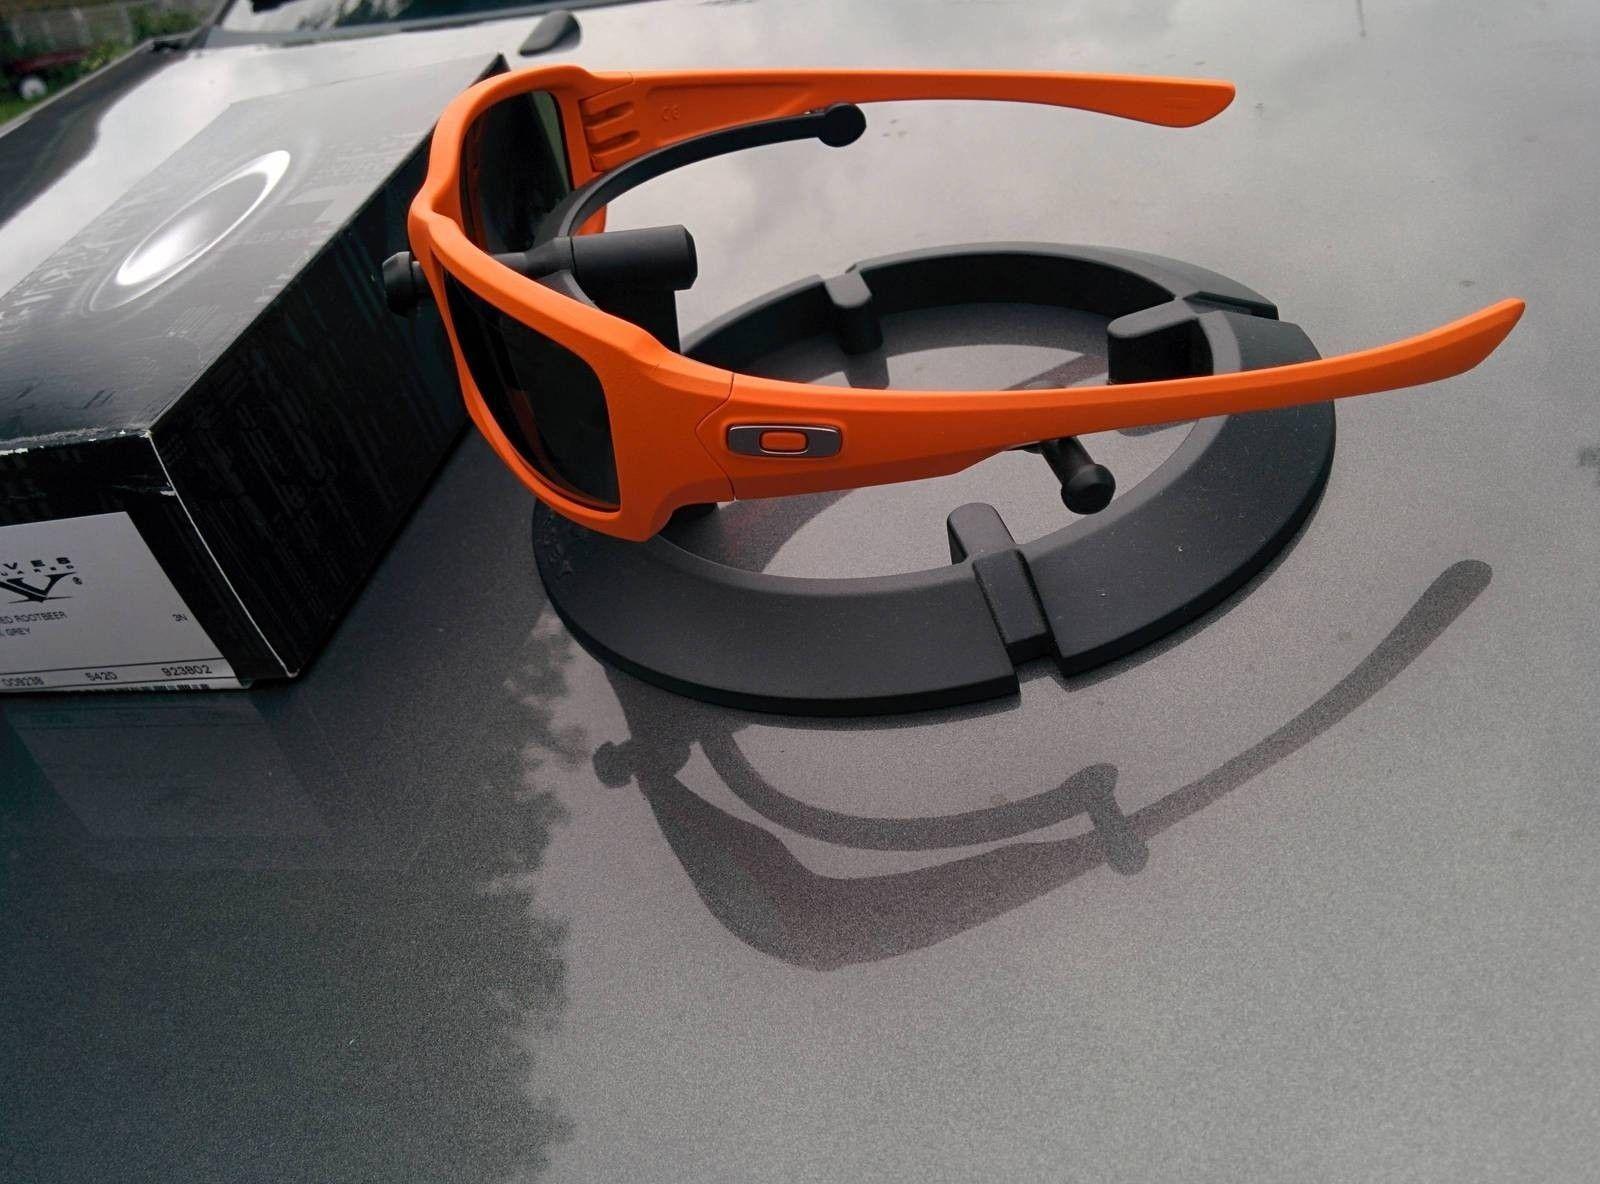 Safety Orange Cerakote Fives Squared/Grey Lens - PWVrSiB.jpg